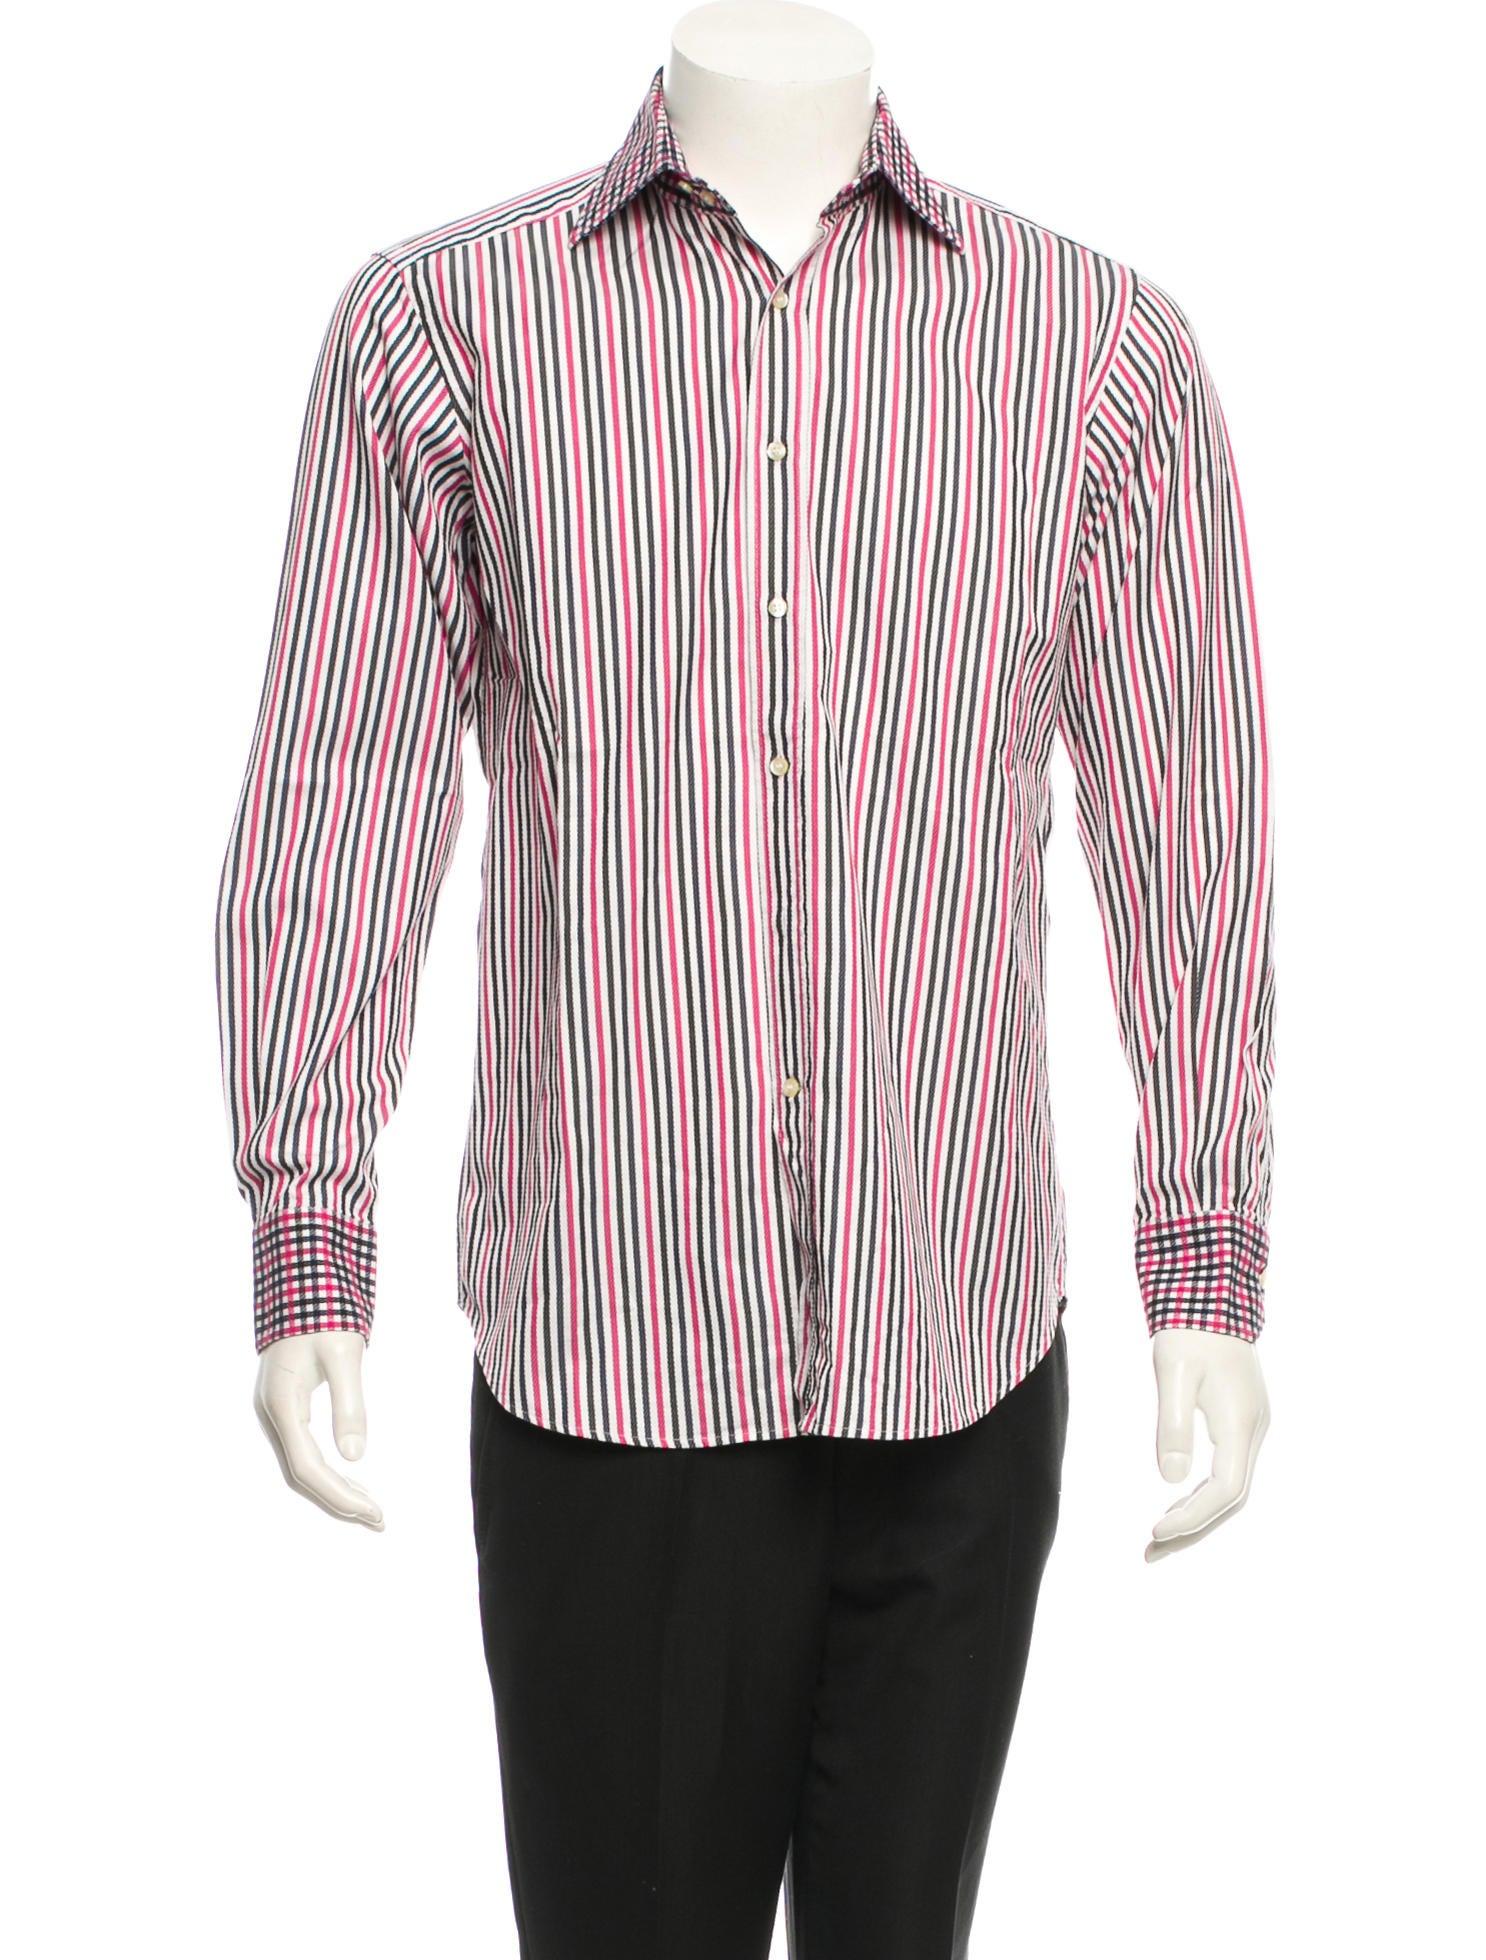 Etro shirt mens shirts etr27637 the realreal for Etro men s shirts